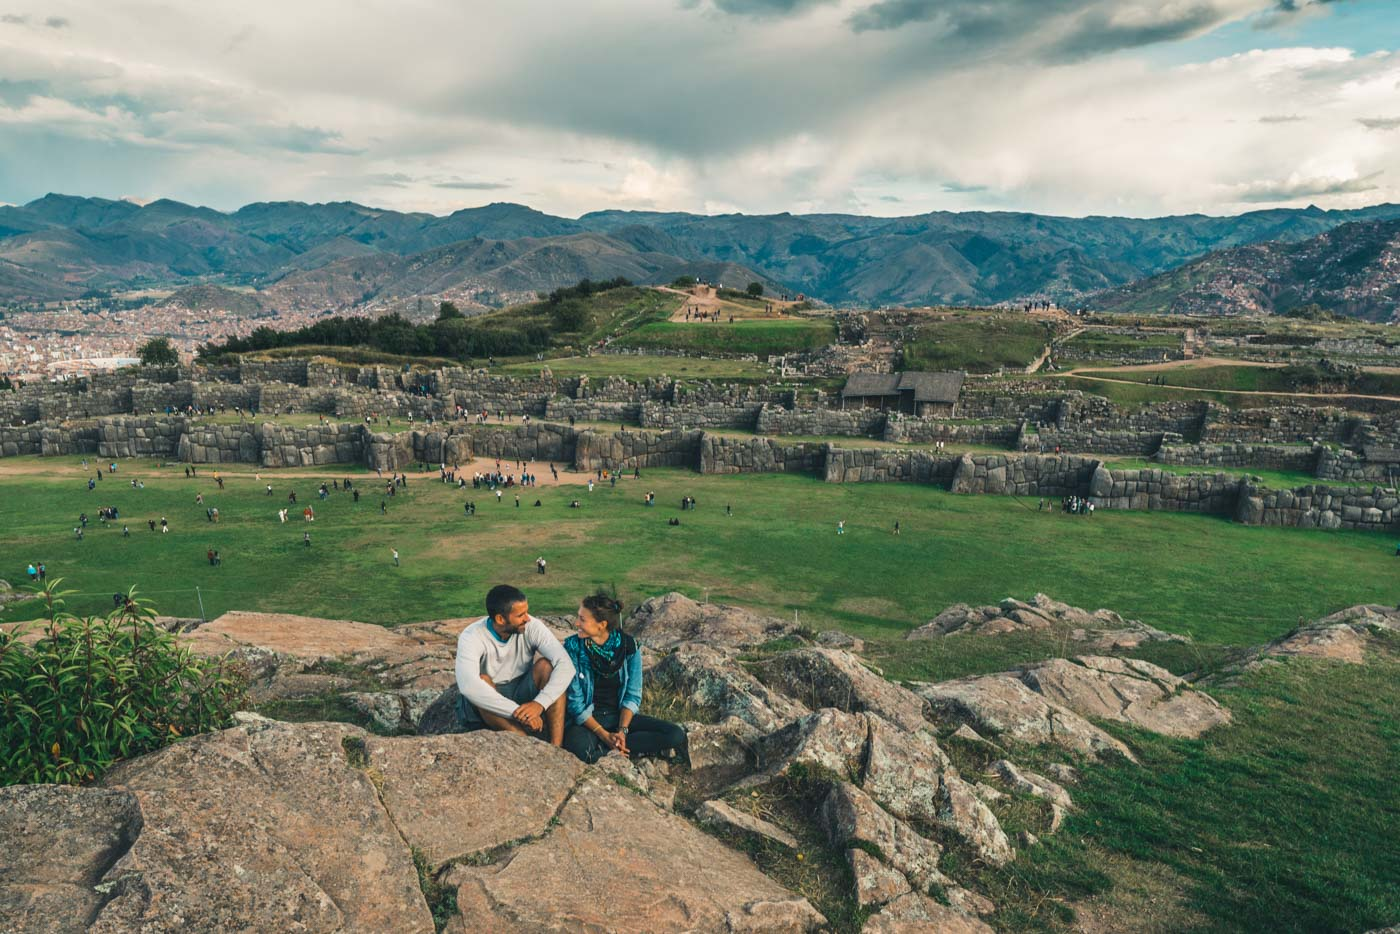 At the Sacsayhuaman Ruins in Cusco, Peru